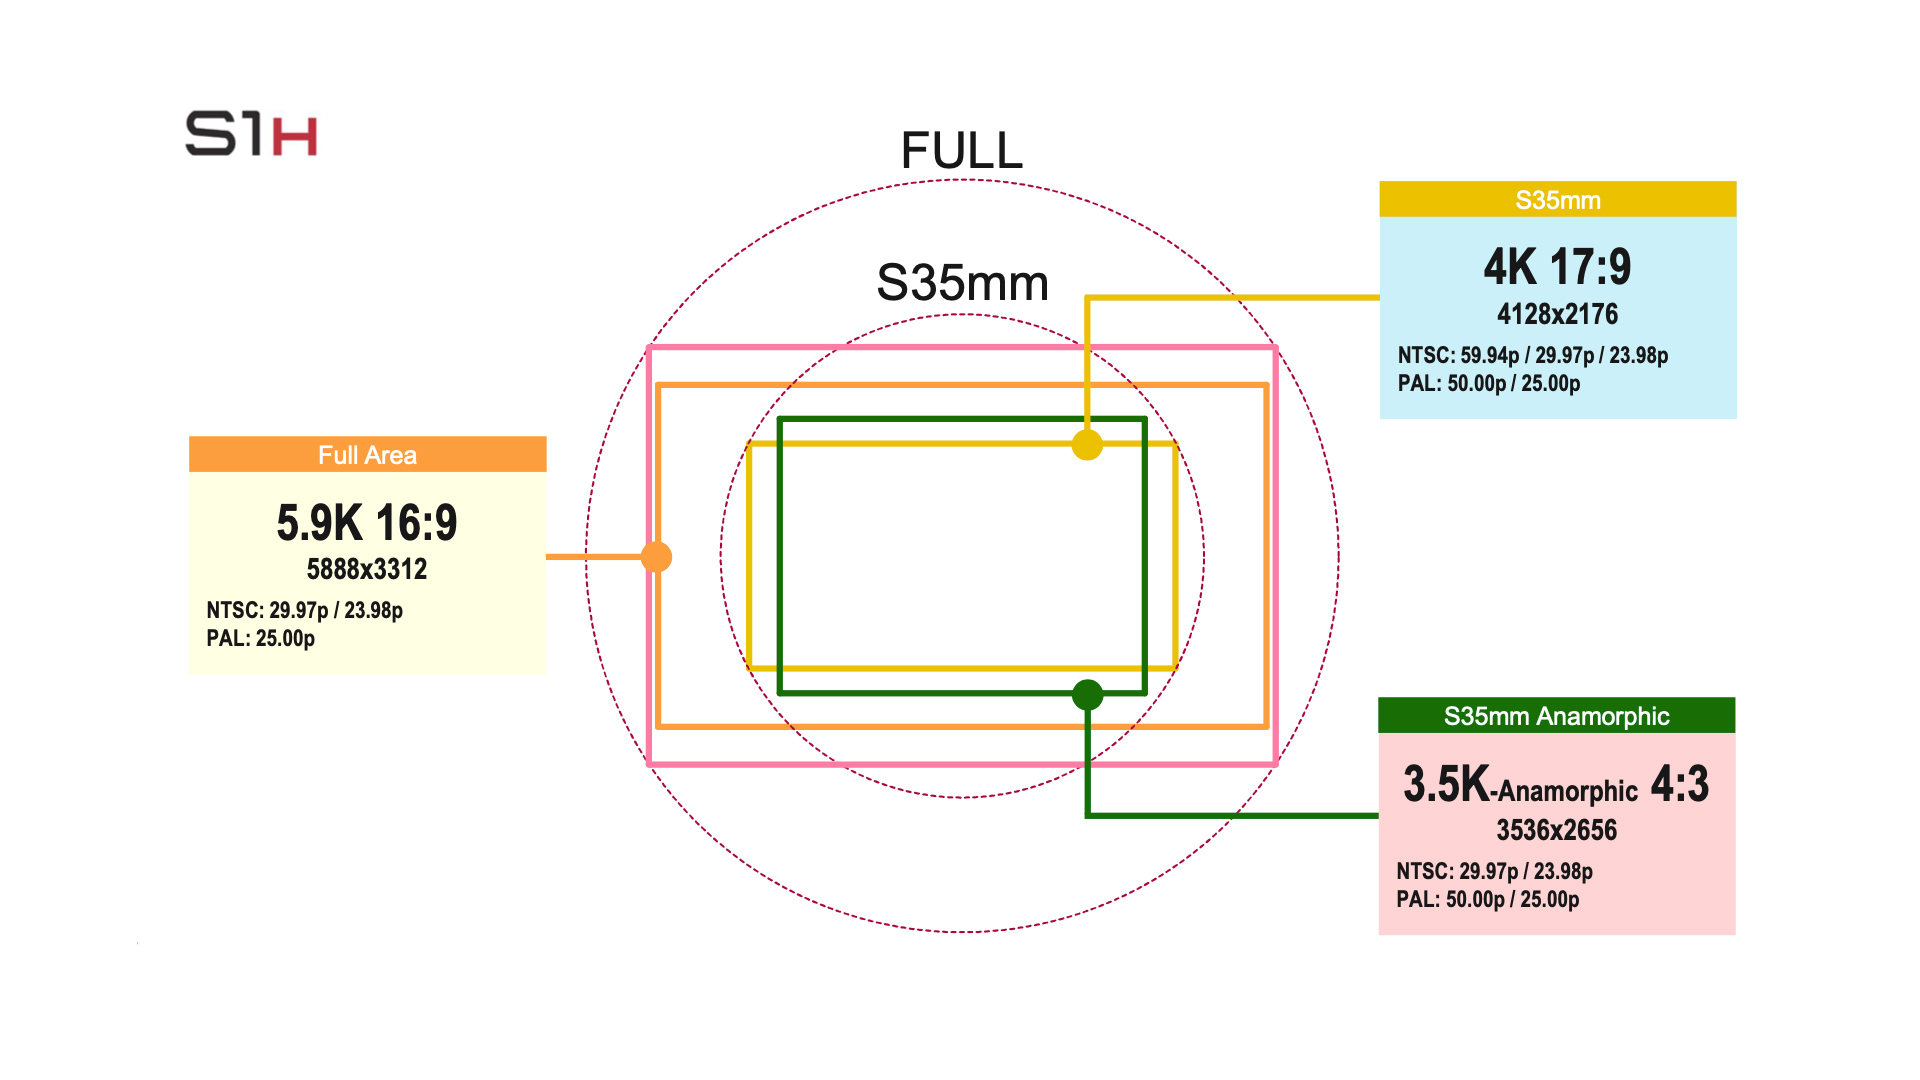 Panasonic S1H의 펌웨어 Ver 2.0 적용 시 RAW 출력 해상도와 화면비